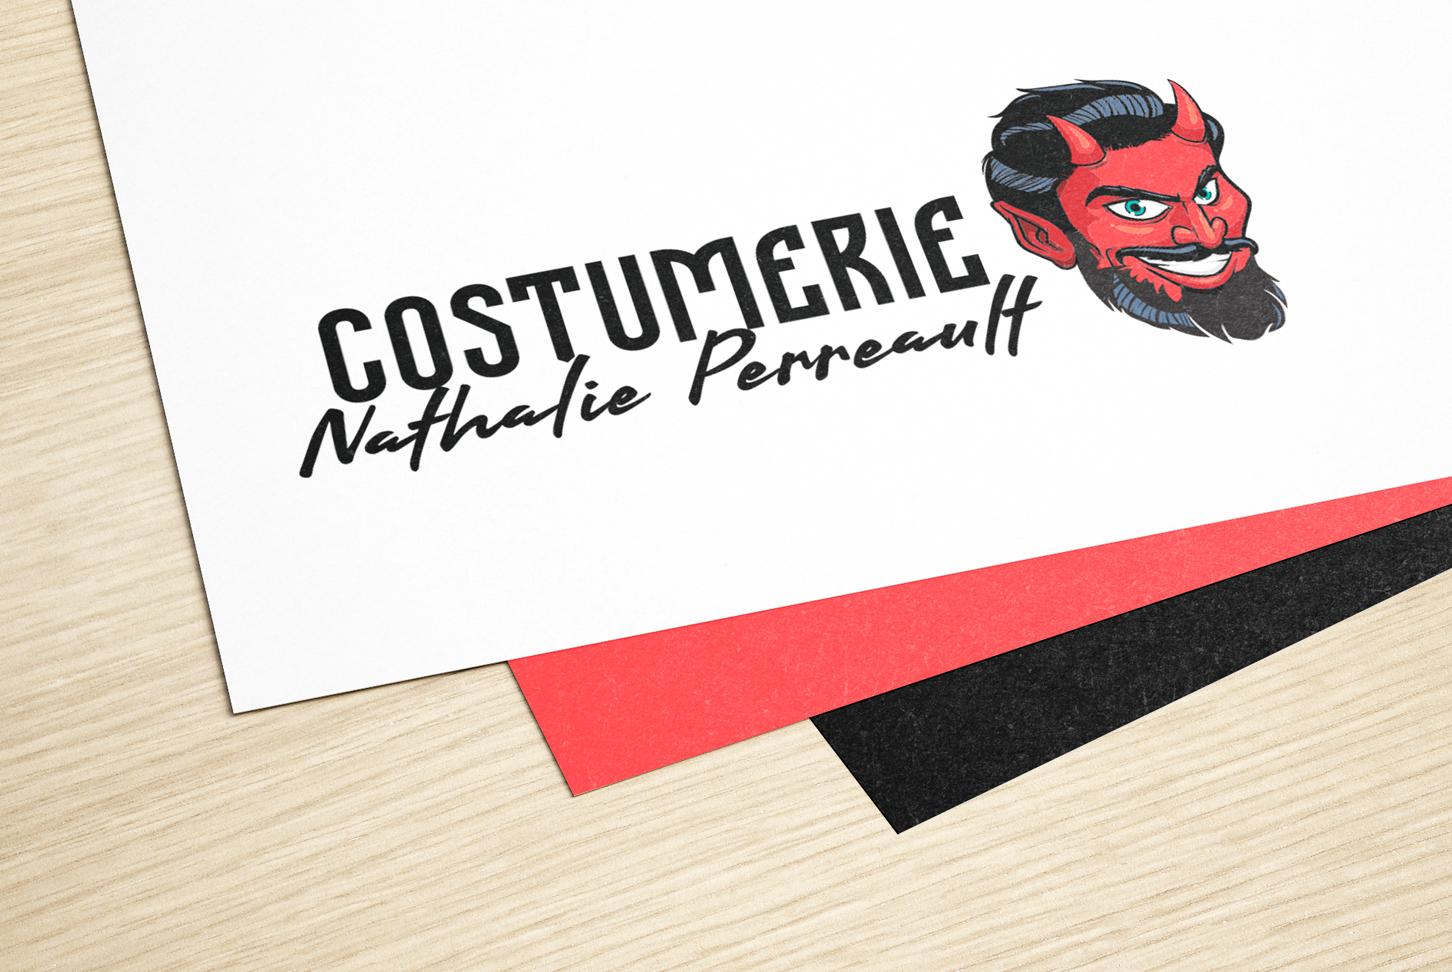 Costumerie Nathalie Perreault - Logo